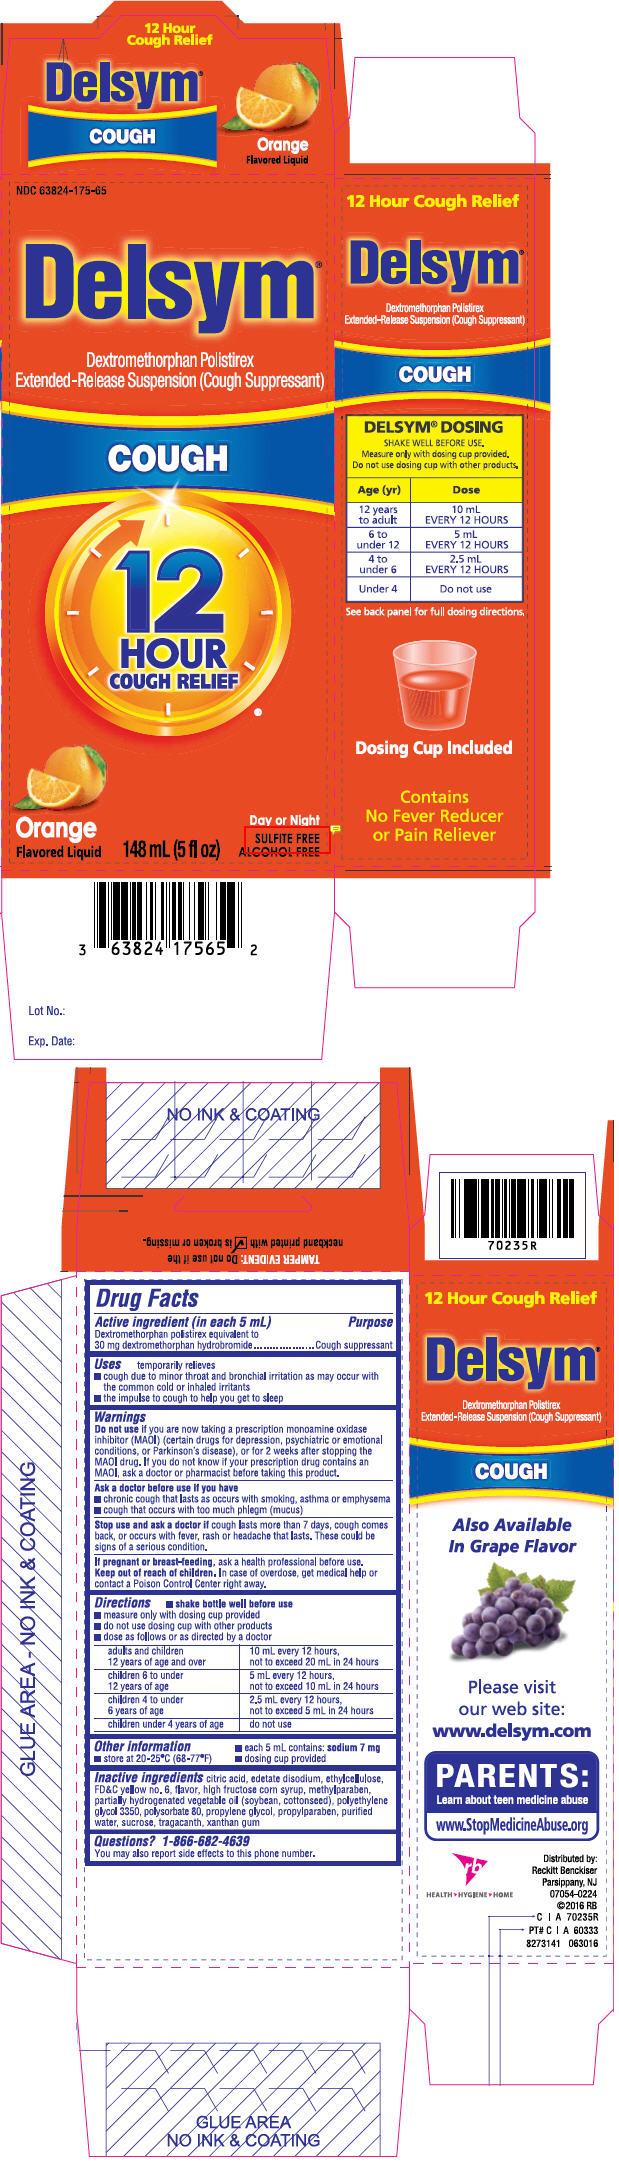 PRINCIPAL DISPLAY PANEL - 148 mL Bottle Carton